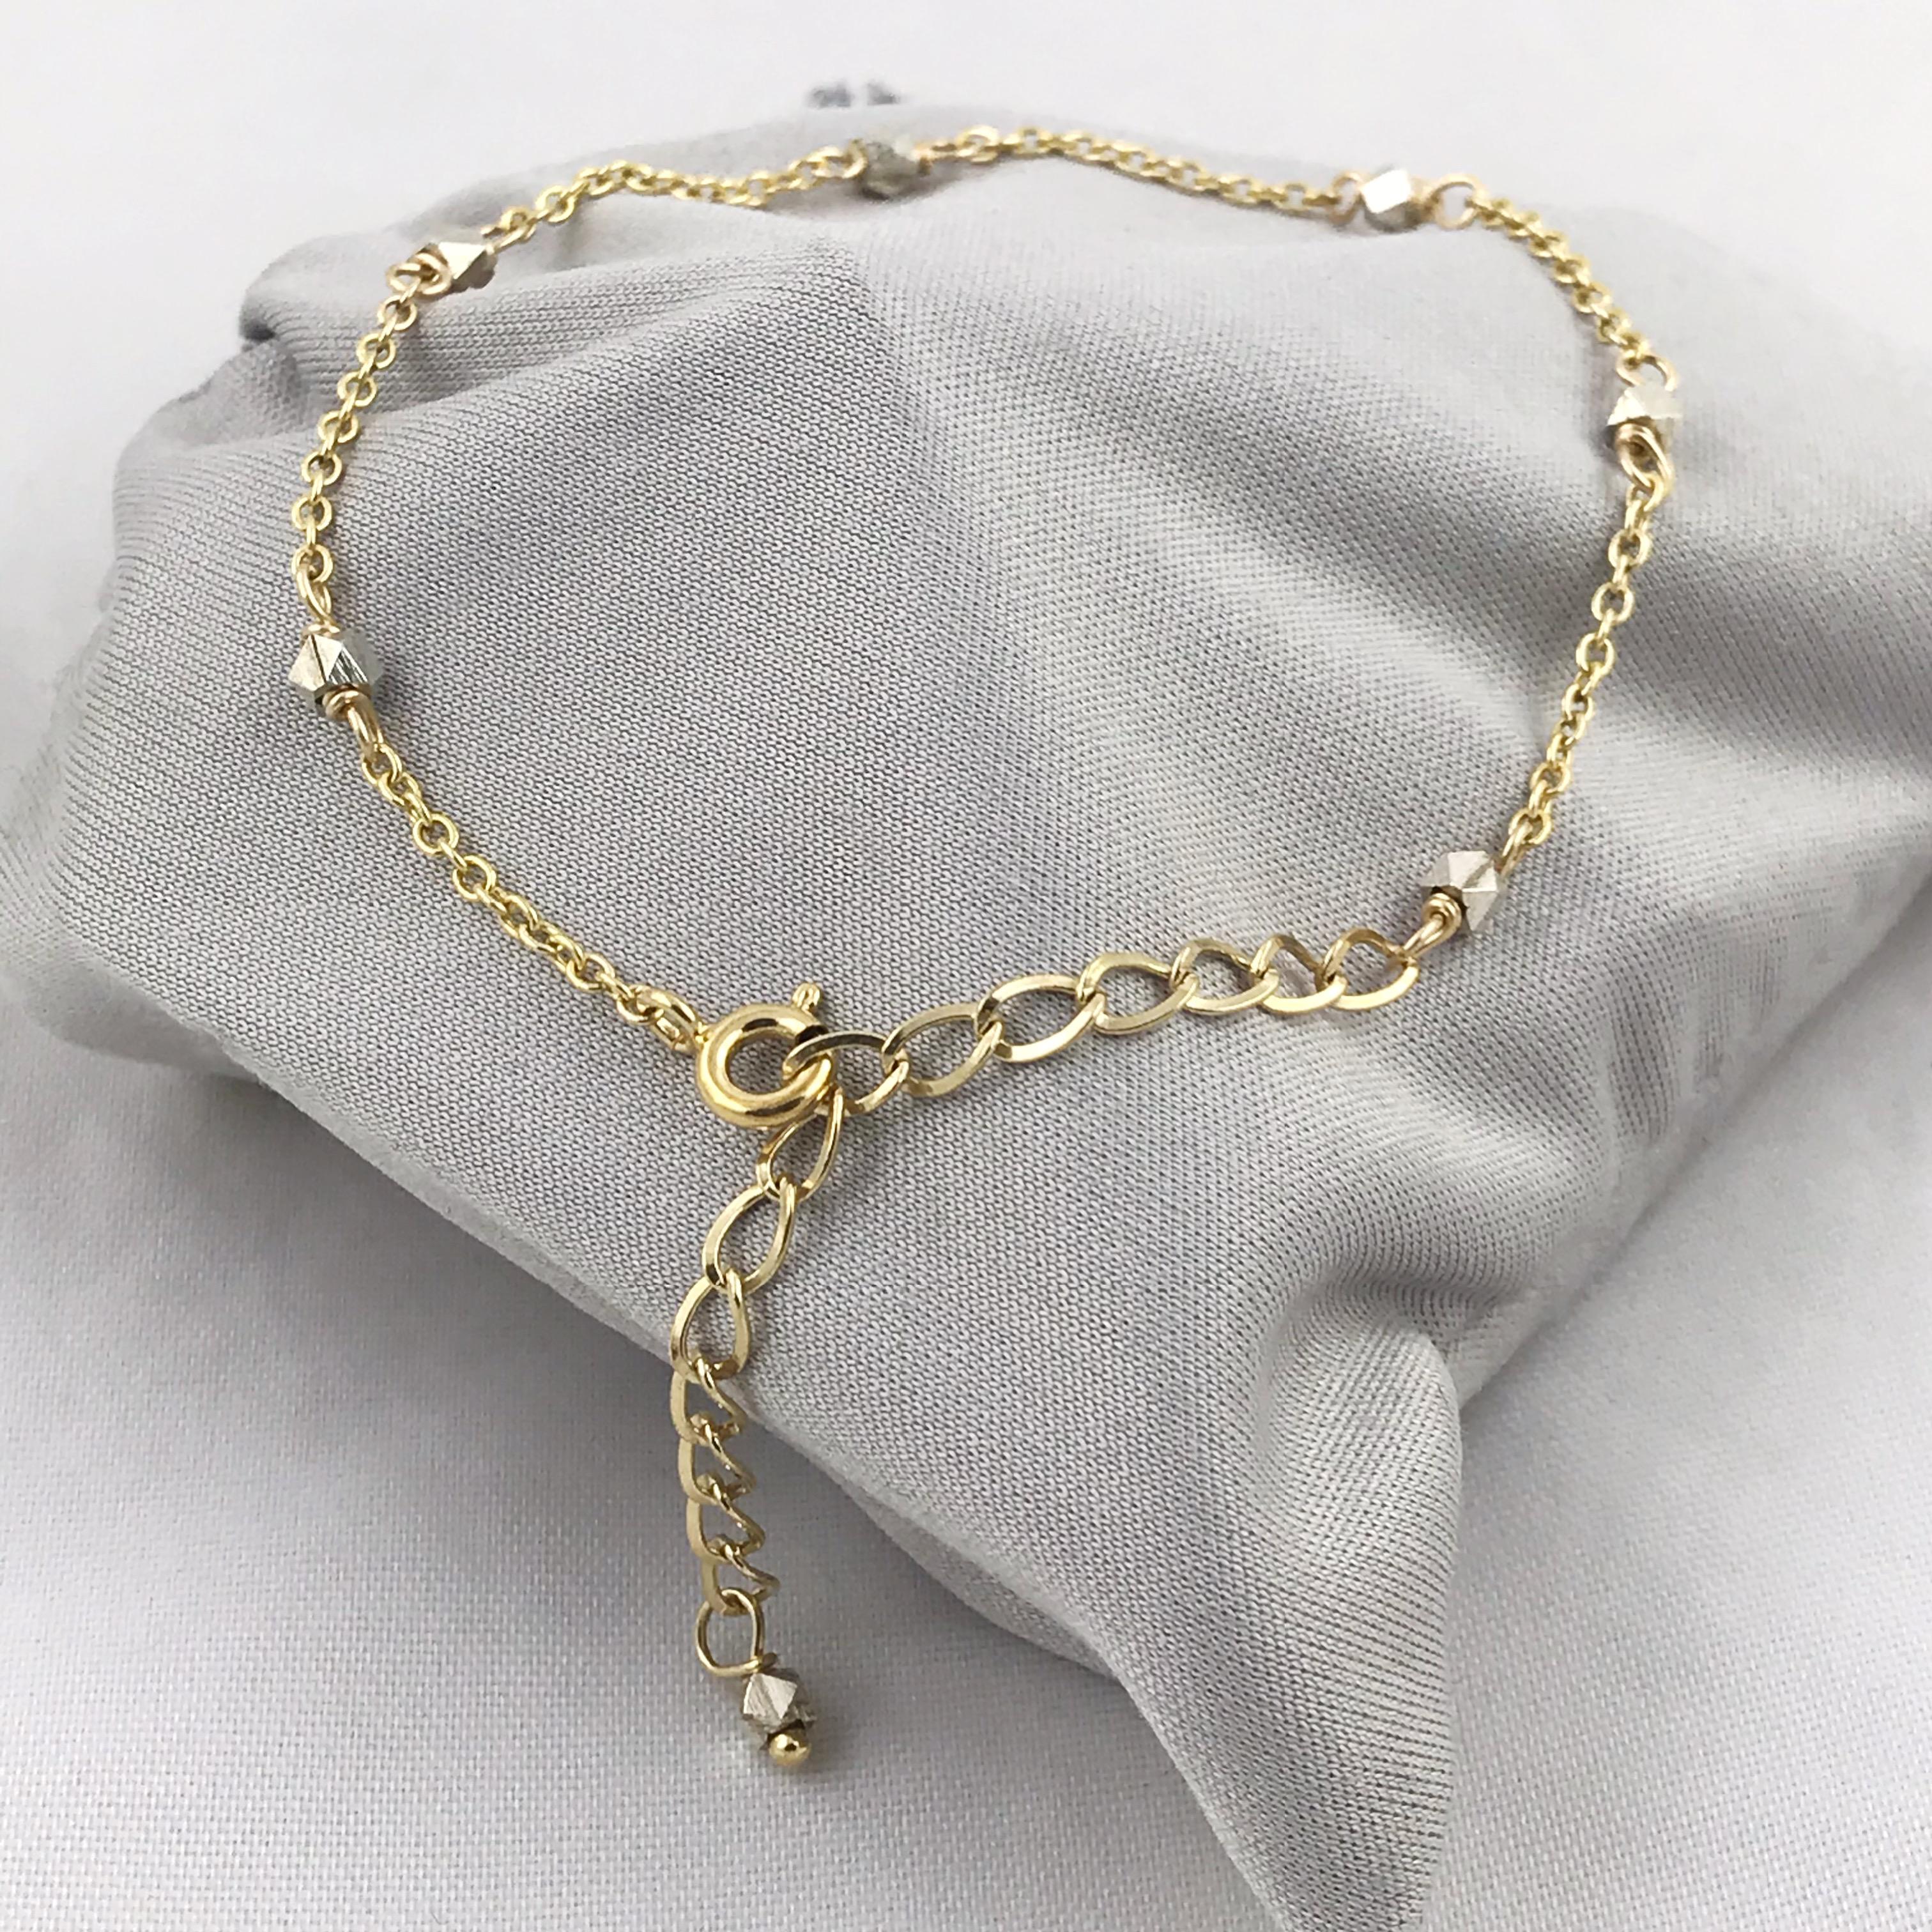 14k Gold-Filled Chain Bracelet